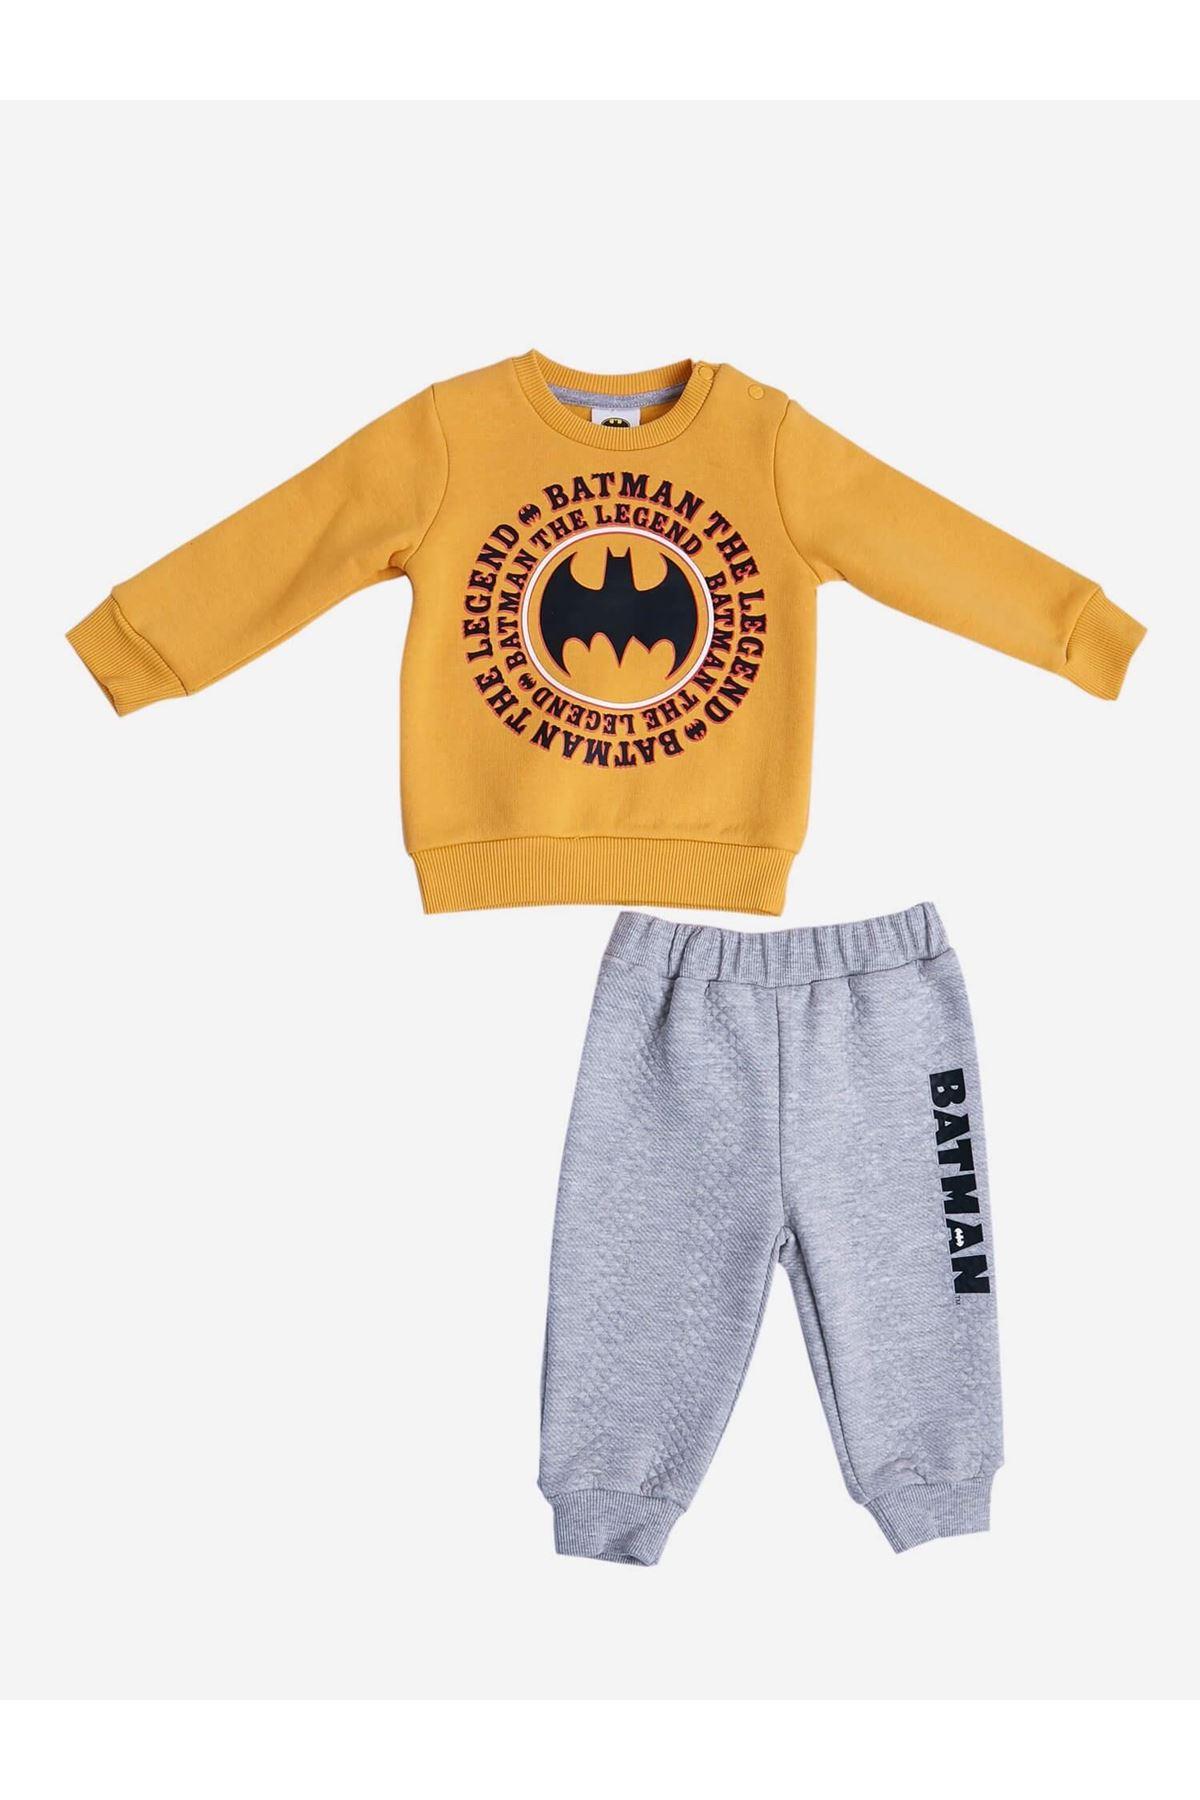 Çimpa Batman 2Li Takım BM18276 Hardal